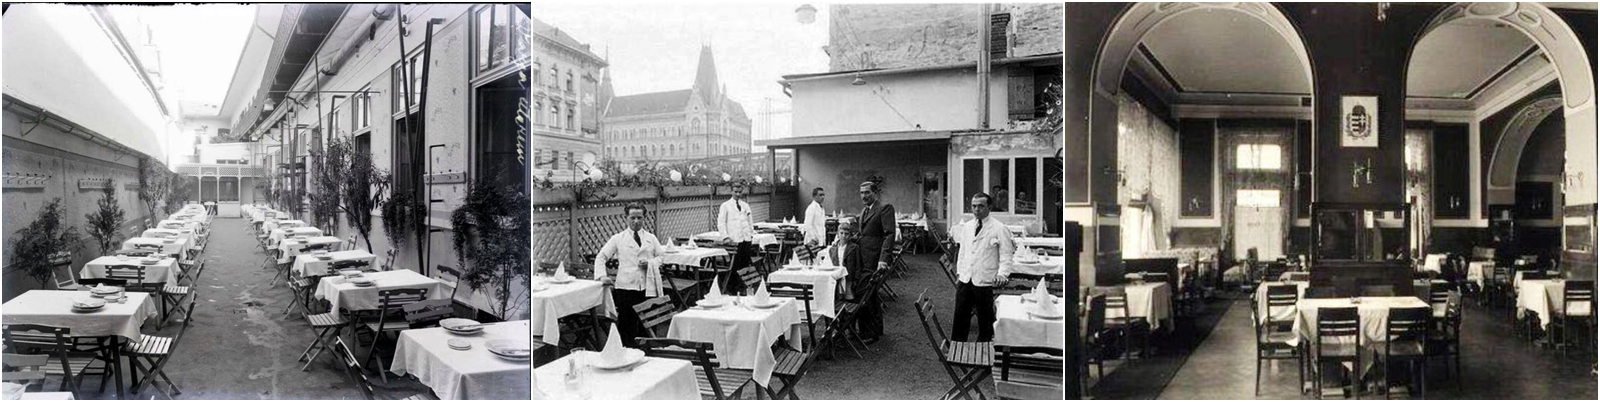 Restaurante Cluj interbelic